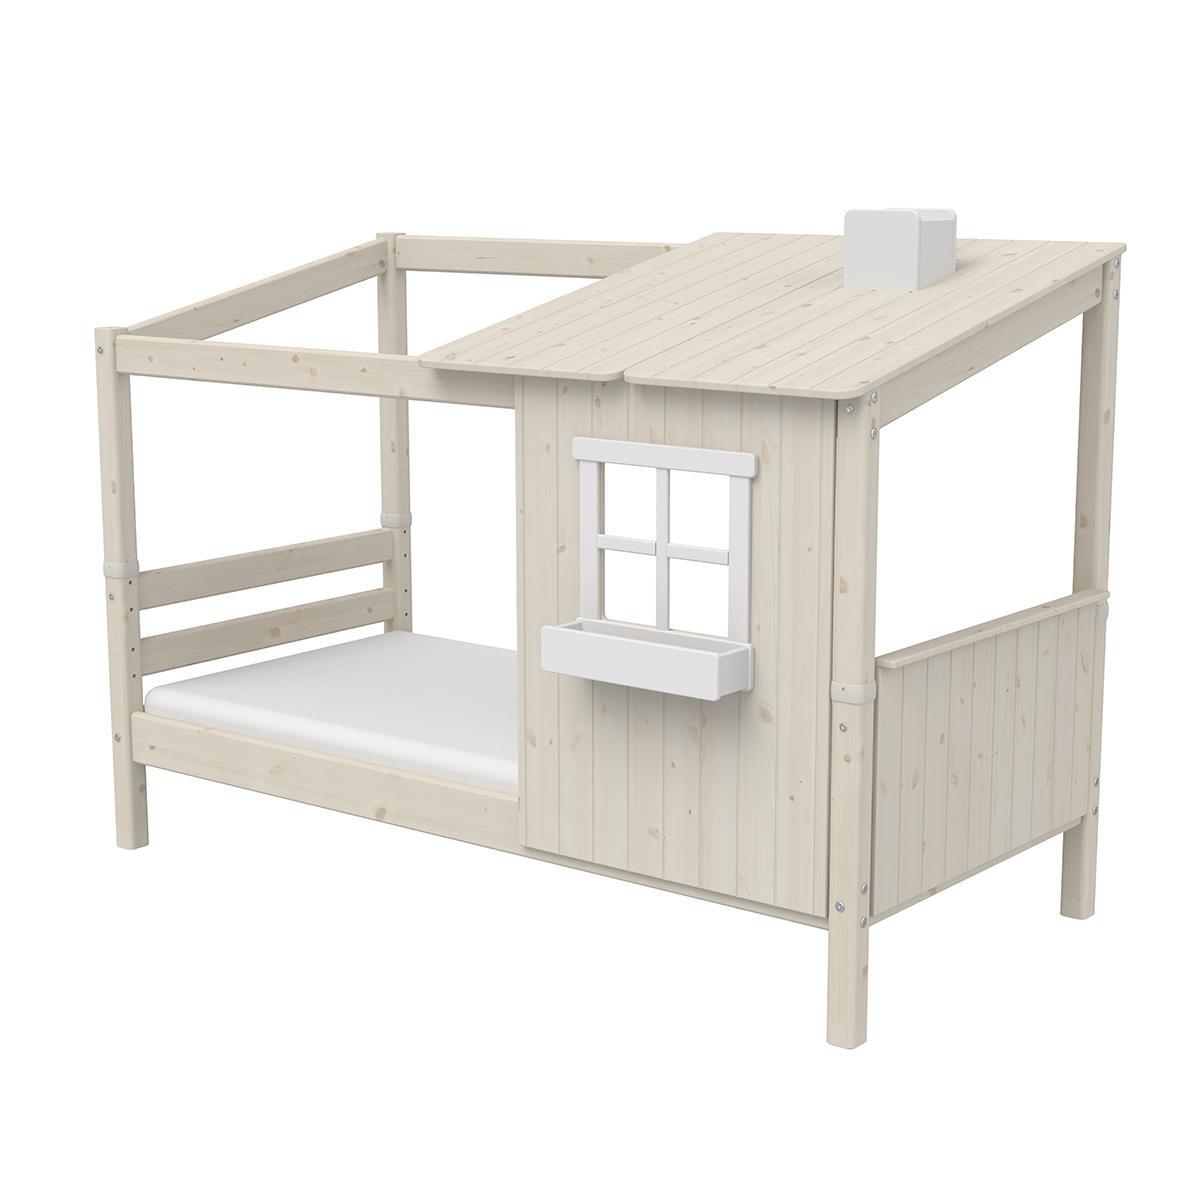 Spielbett Baumhaus 90x200cm 1/2 PLAY HOUSE CLASSIC Flexa weiß